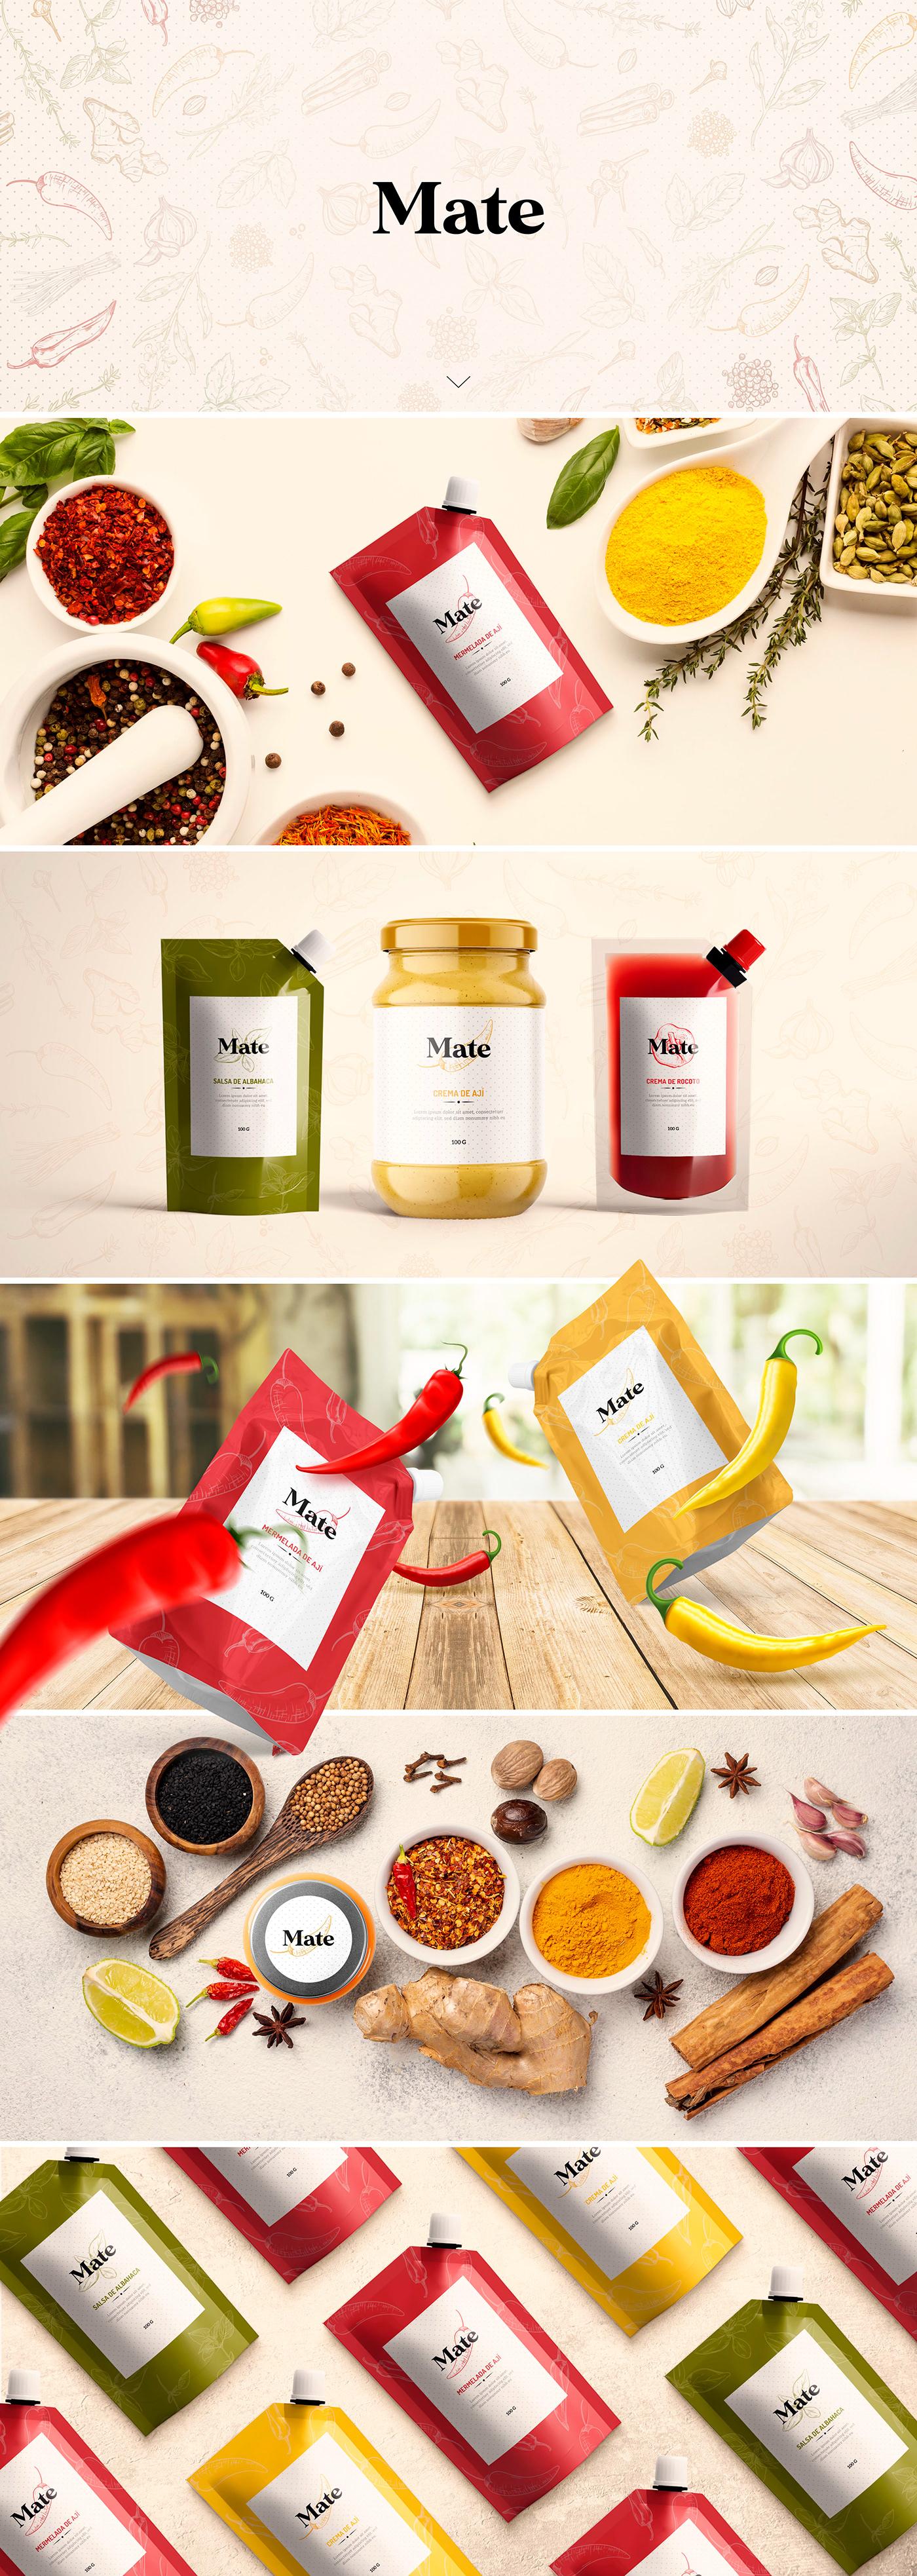 chili design graphic design  Label logo Mockup package pepper sauce spices